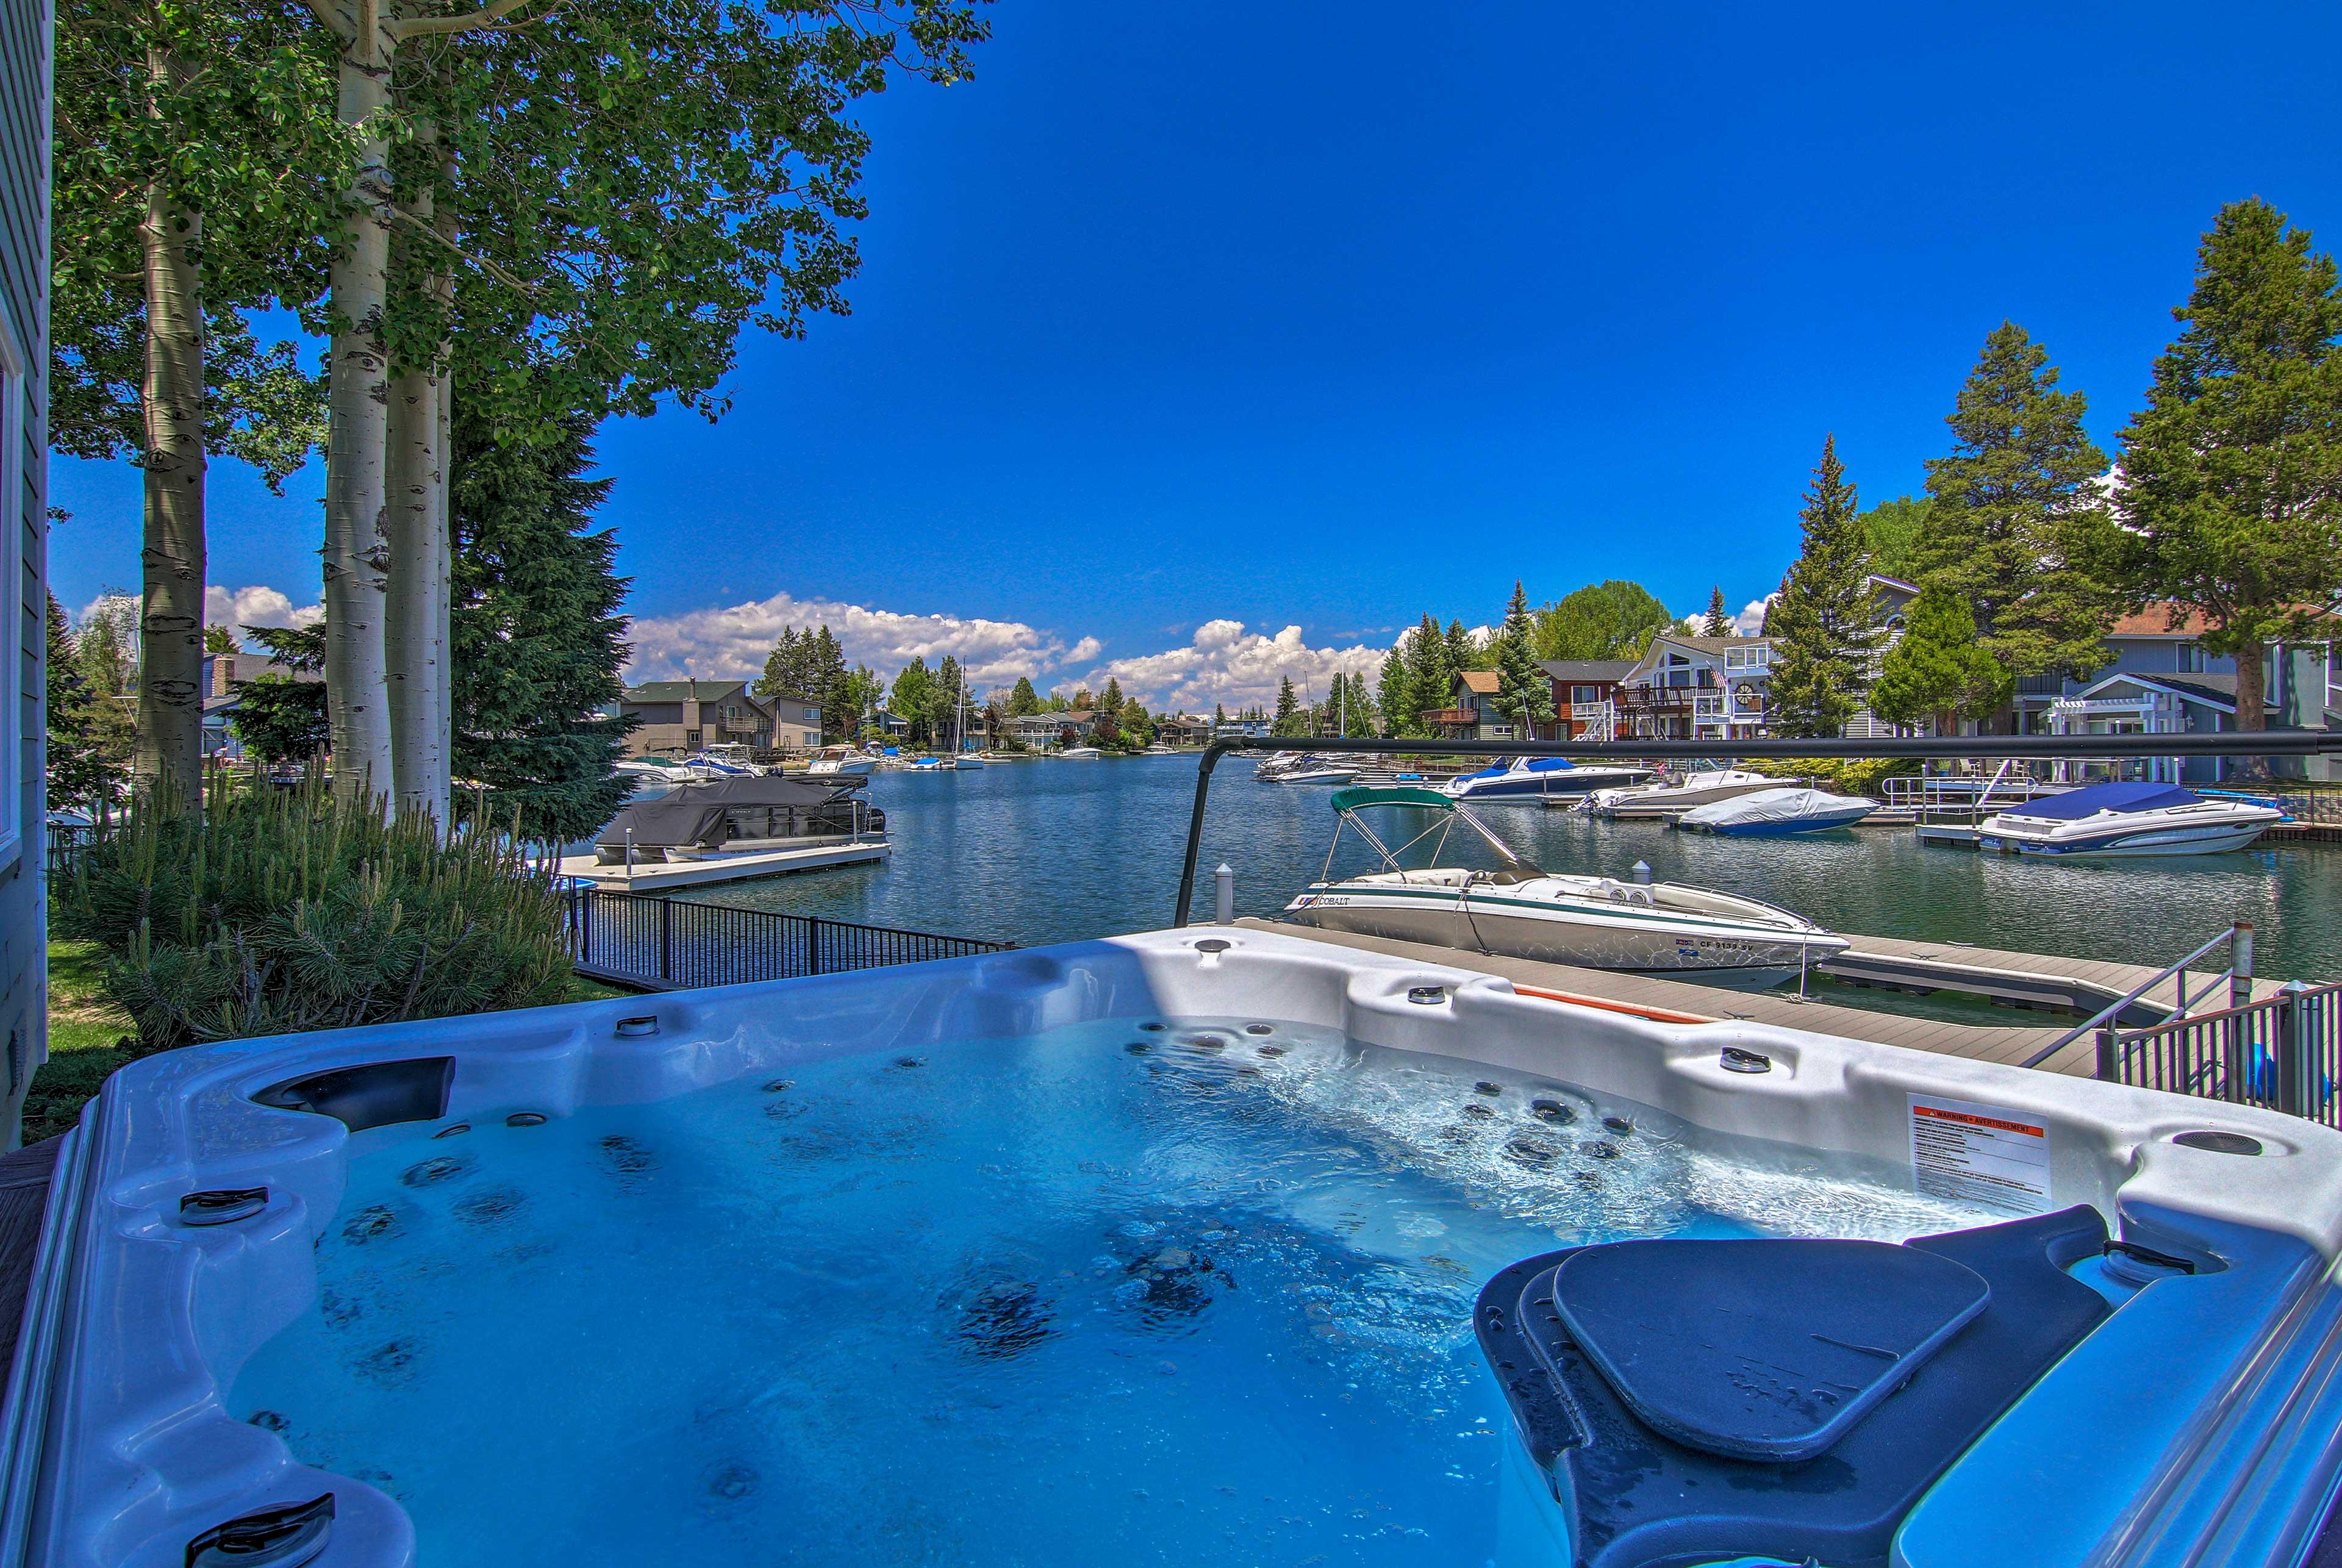 Enjoy a hot tub soak with a view.